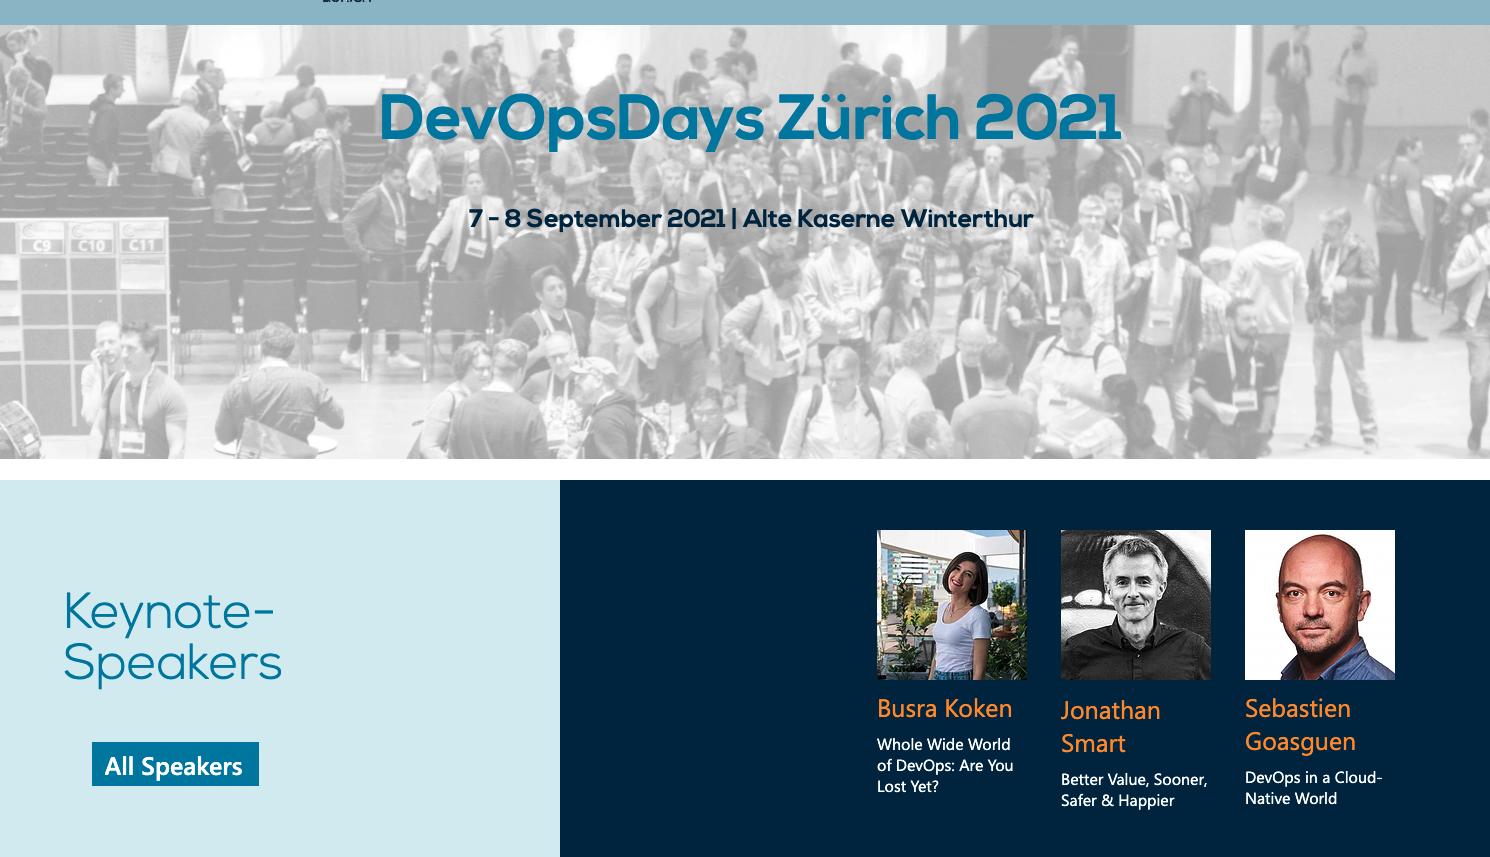 Sept. 7: DevOpsDays Zürich 2021 - TriggerMesh Sebastien Goasguen Keynote Speaker